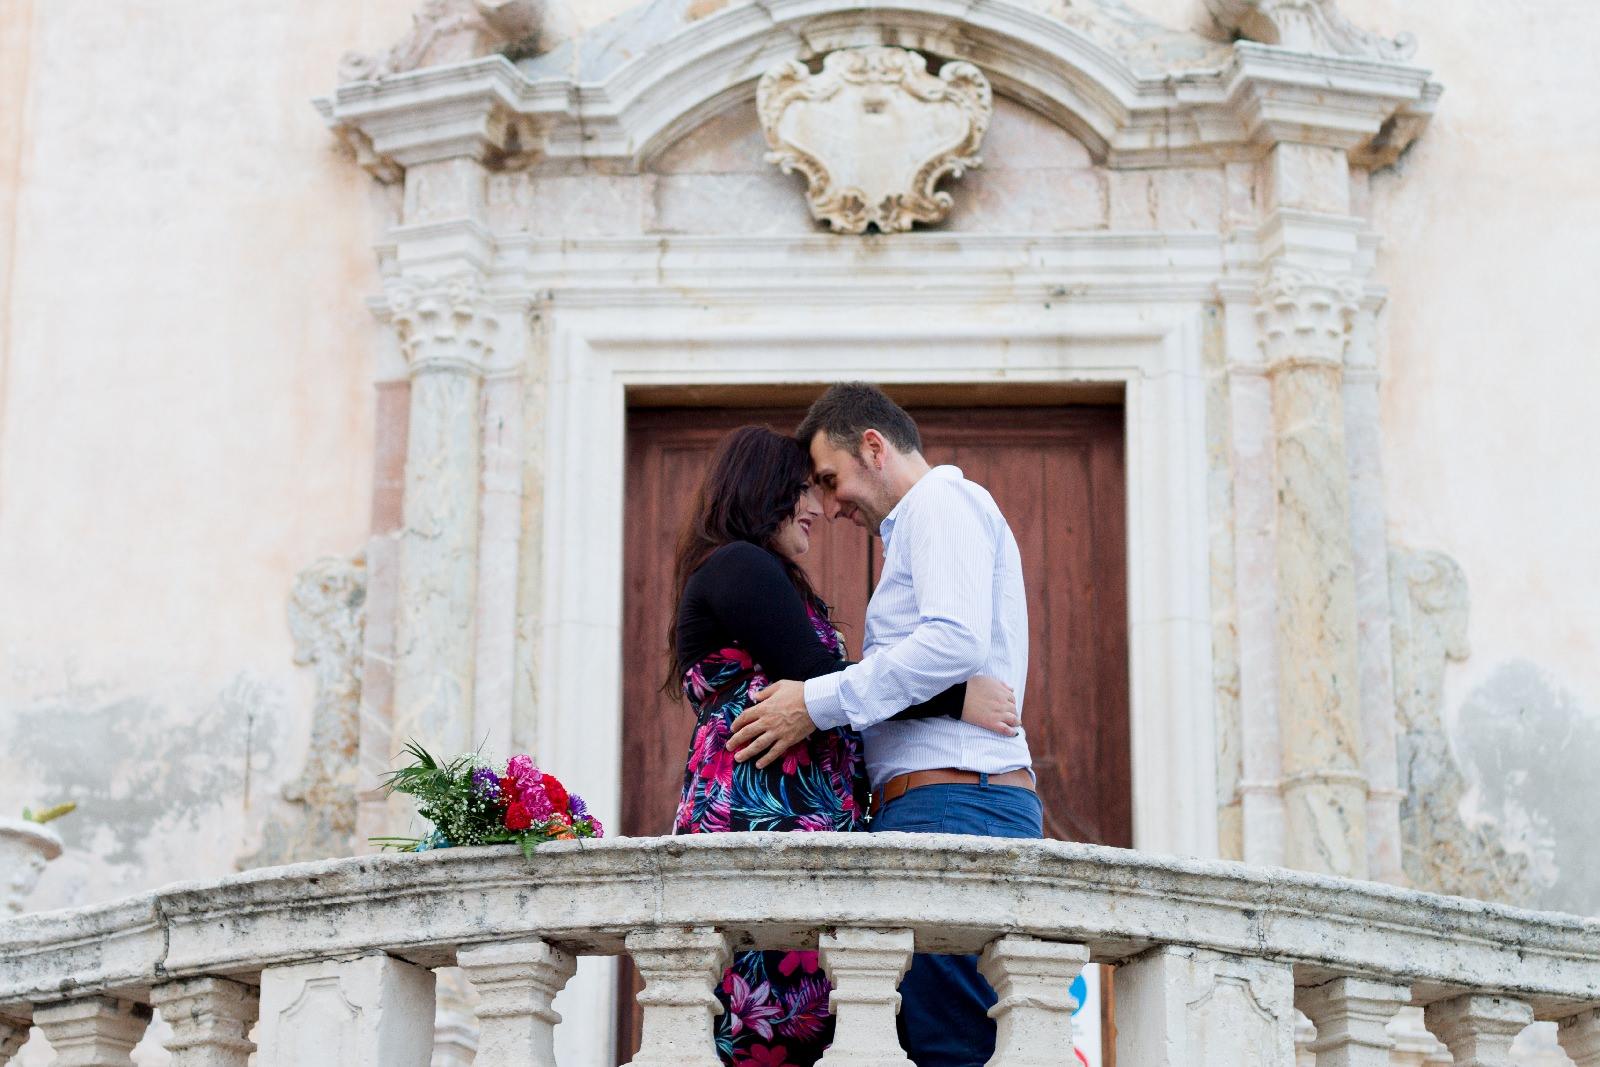 103-2018-09-22-Engagement-Alessandra-e-Igor-Pizzone-125